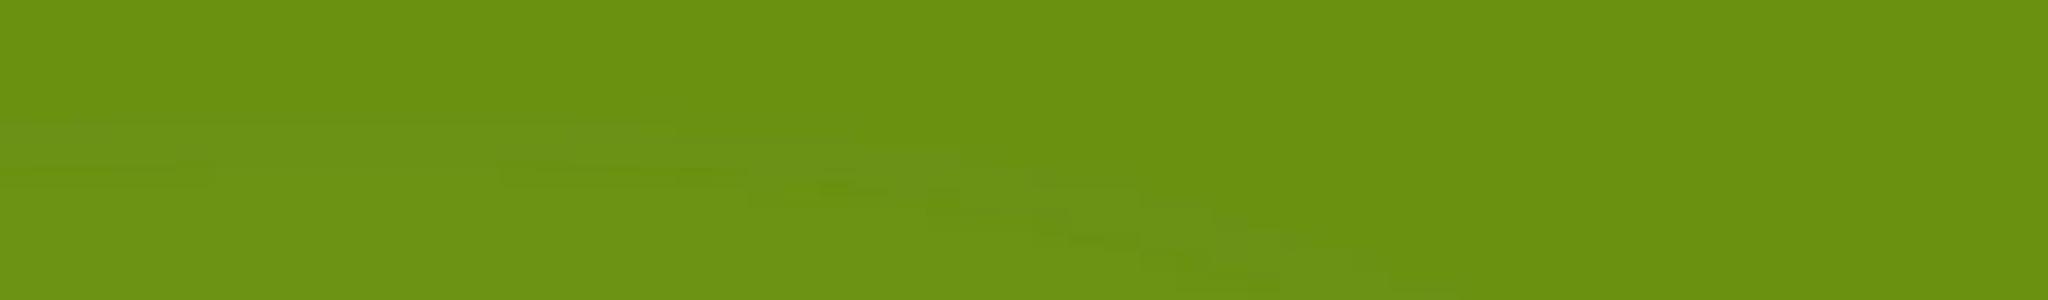 HU 16530 ABS Edge Green Smooth Gloss 90°